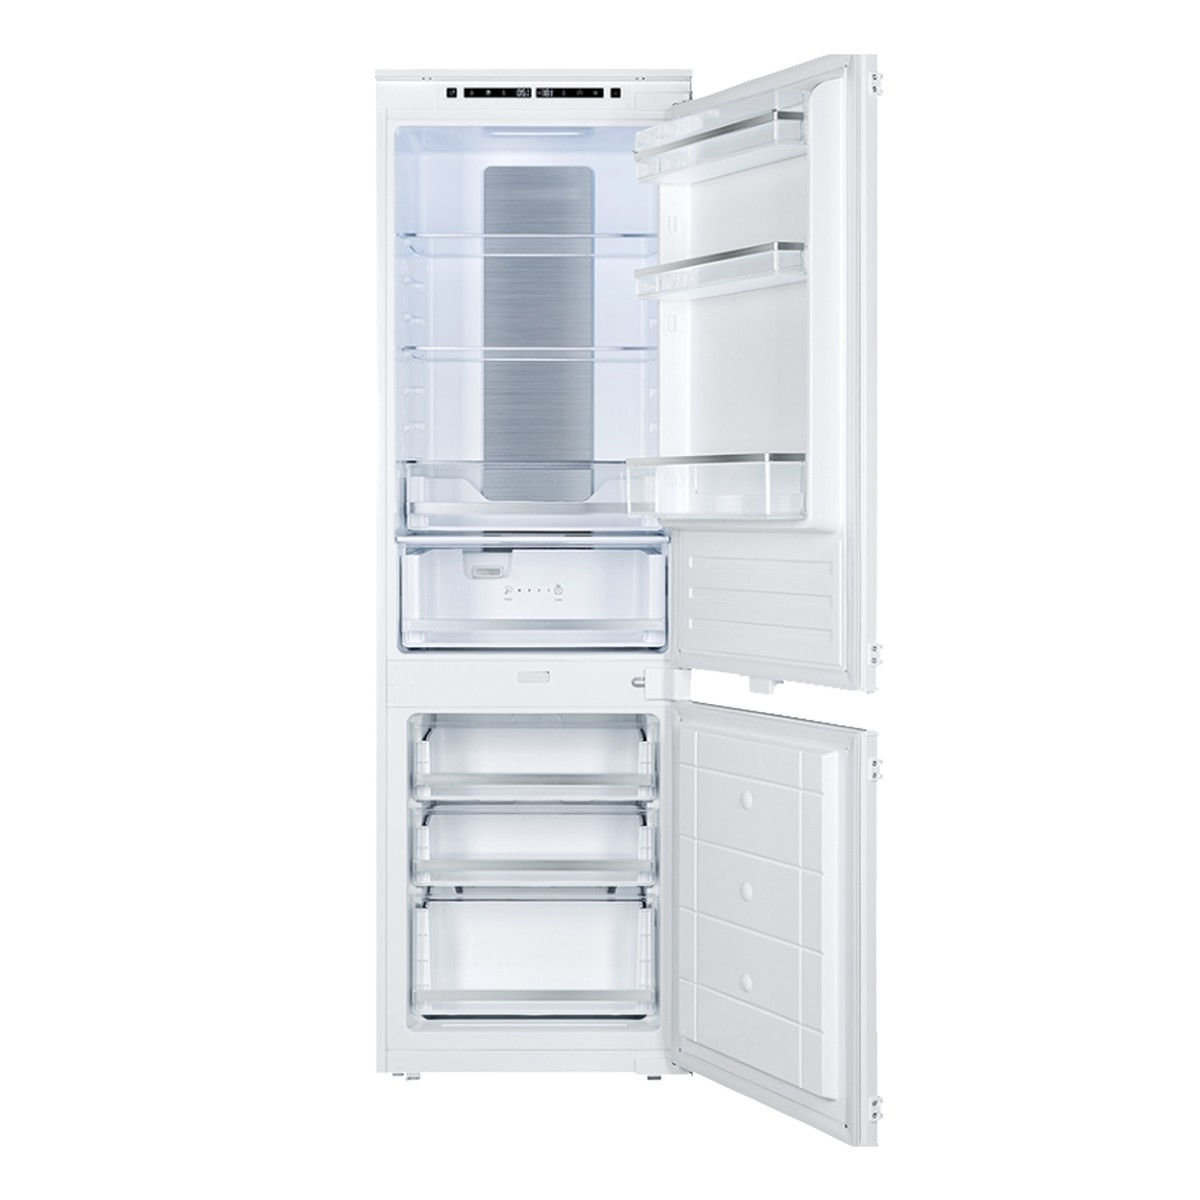 Montpellier MIFF7131F Fridge Freezer